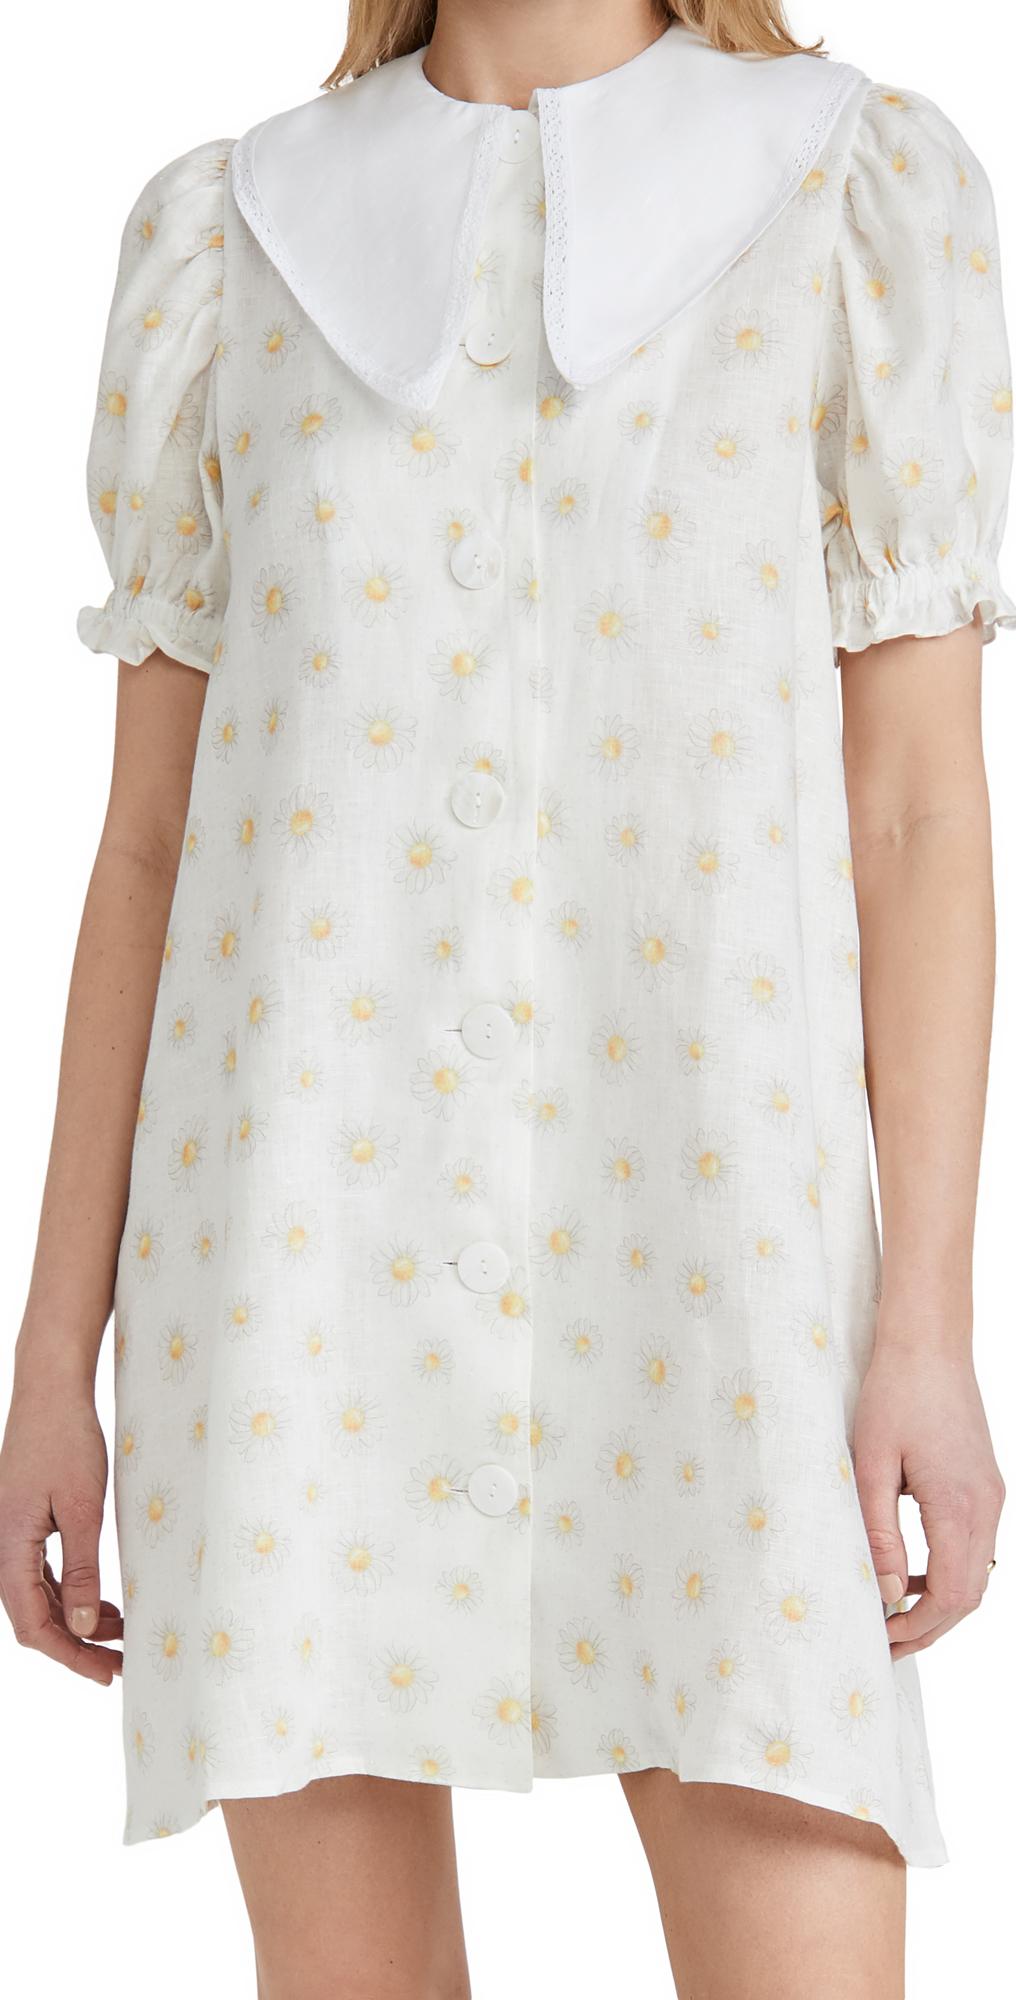 Sleeper Dresses MARIE LINEN DRESS IN DAISIES